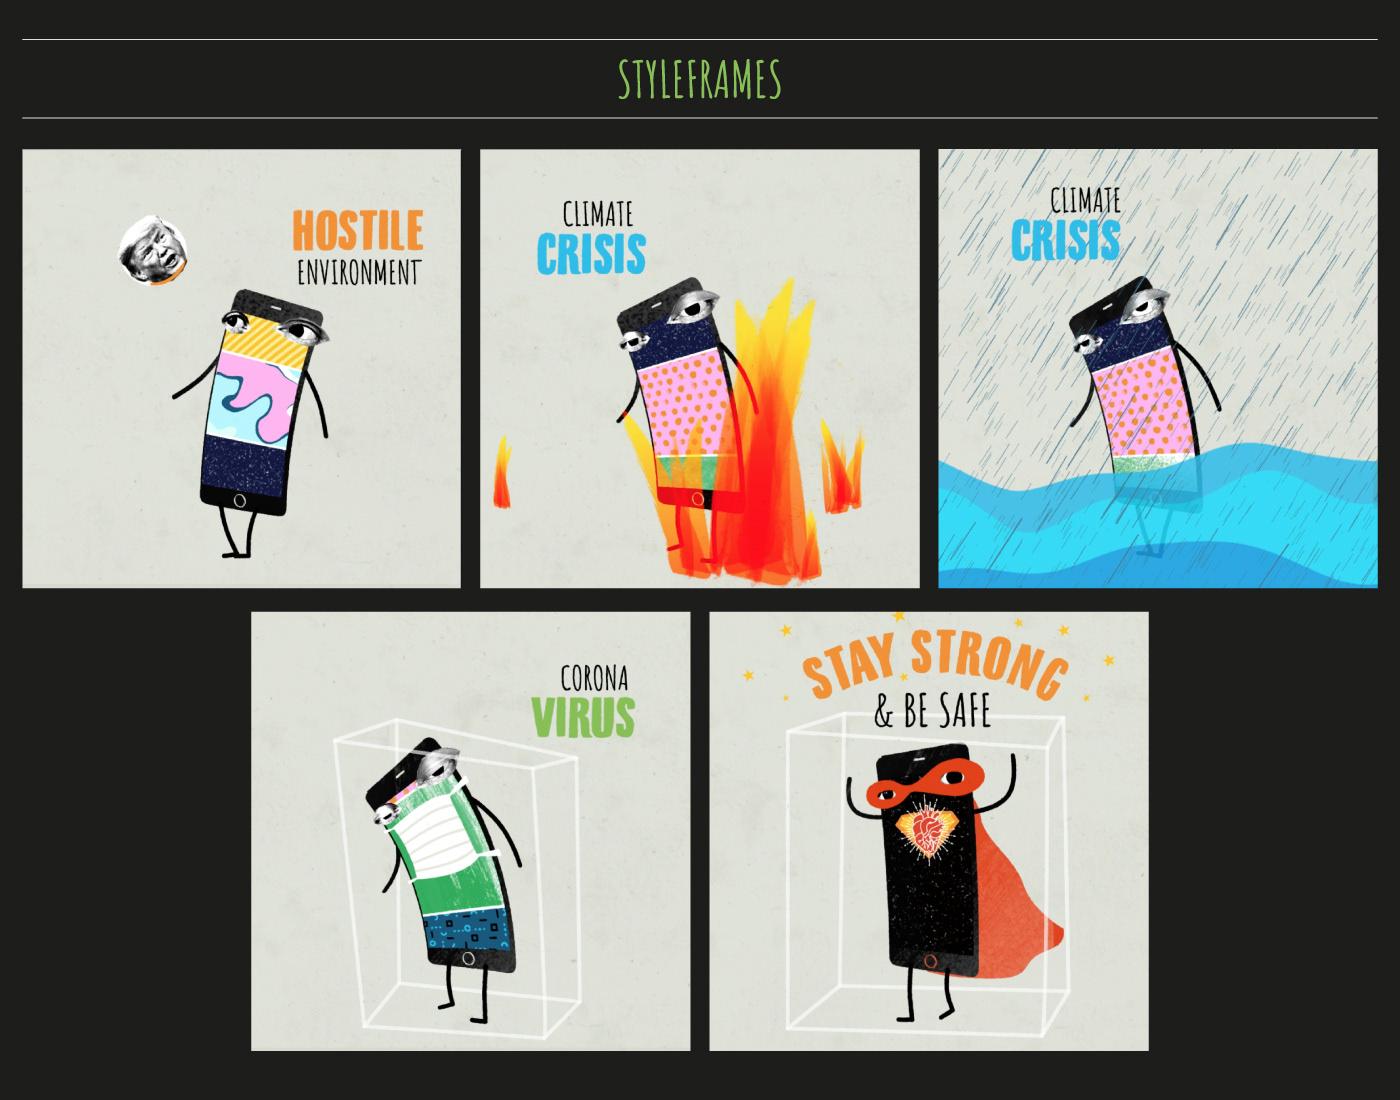 animation  climate change climate crisis corona virus digital hostile environment motion phone smartphone social media